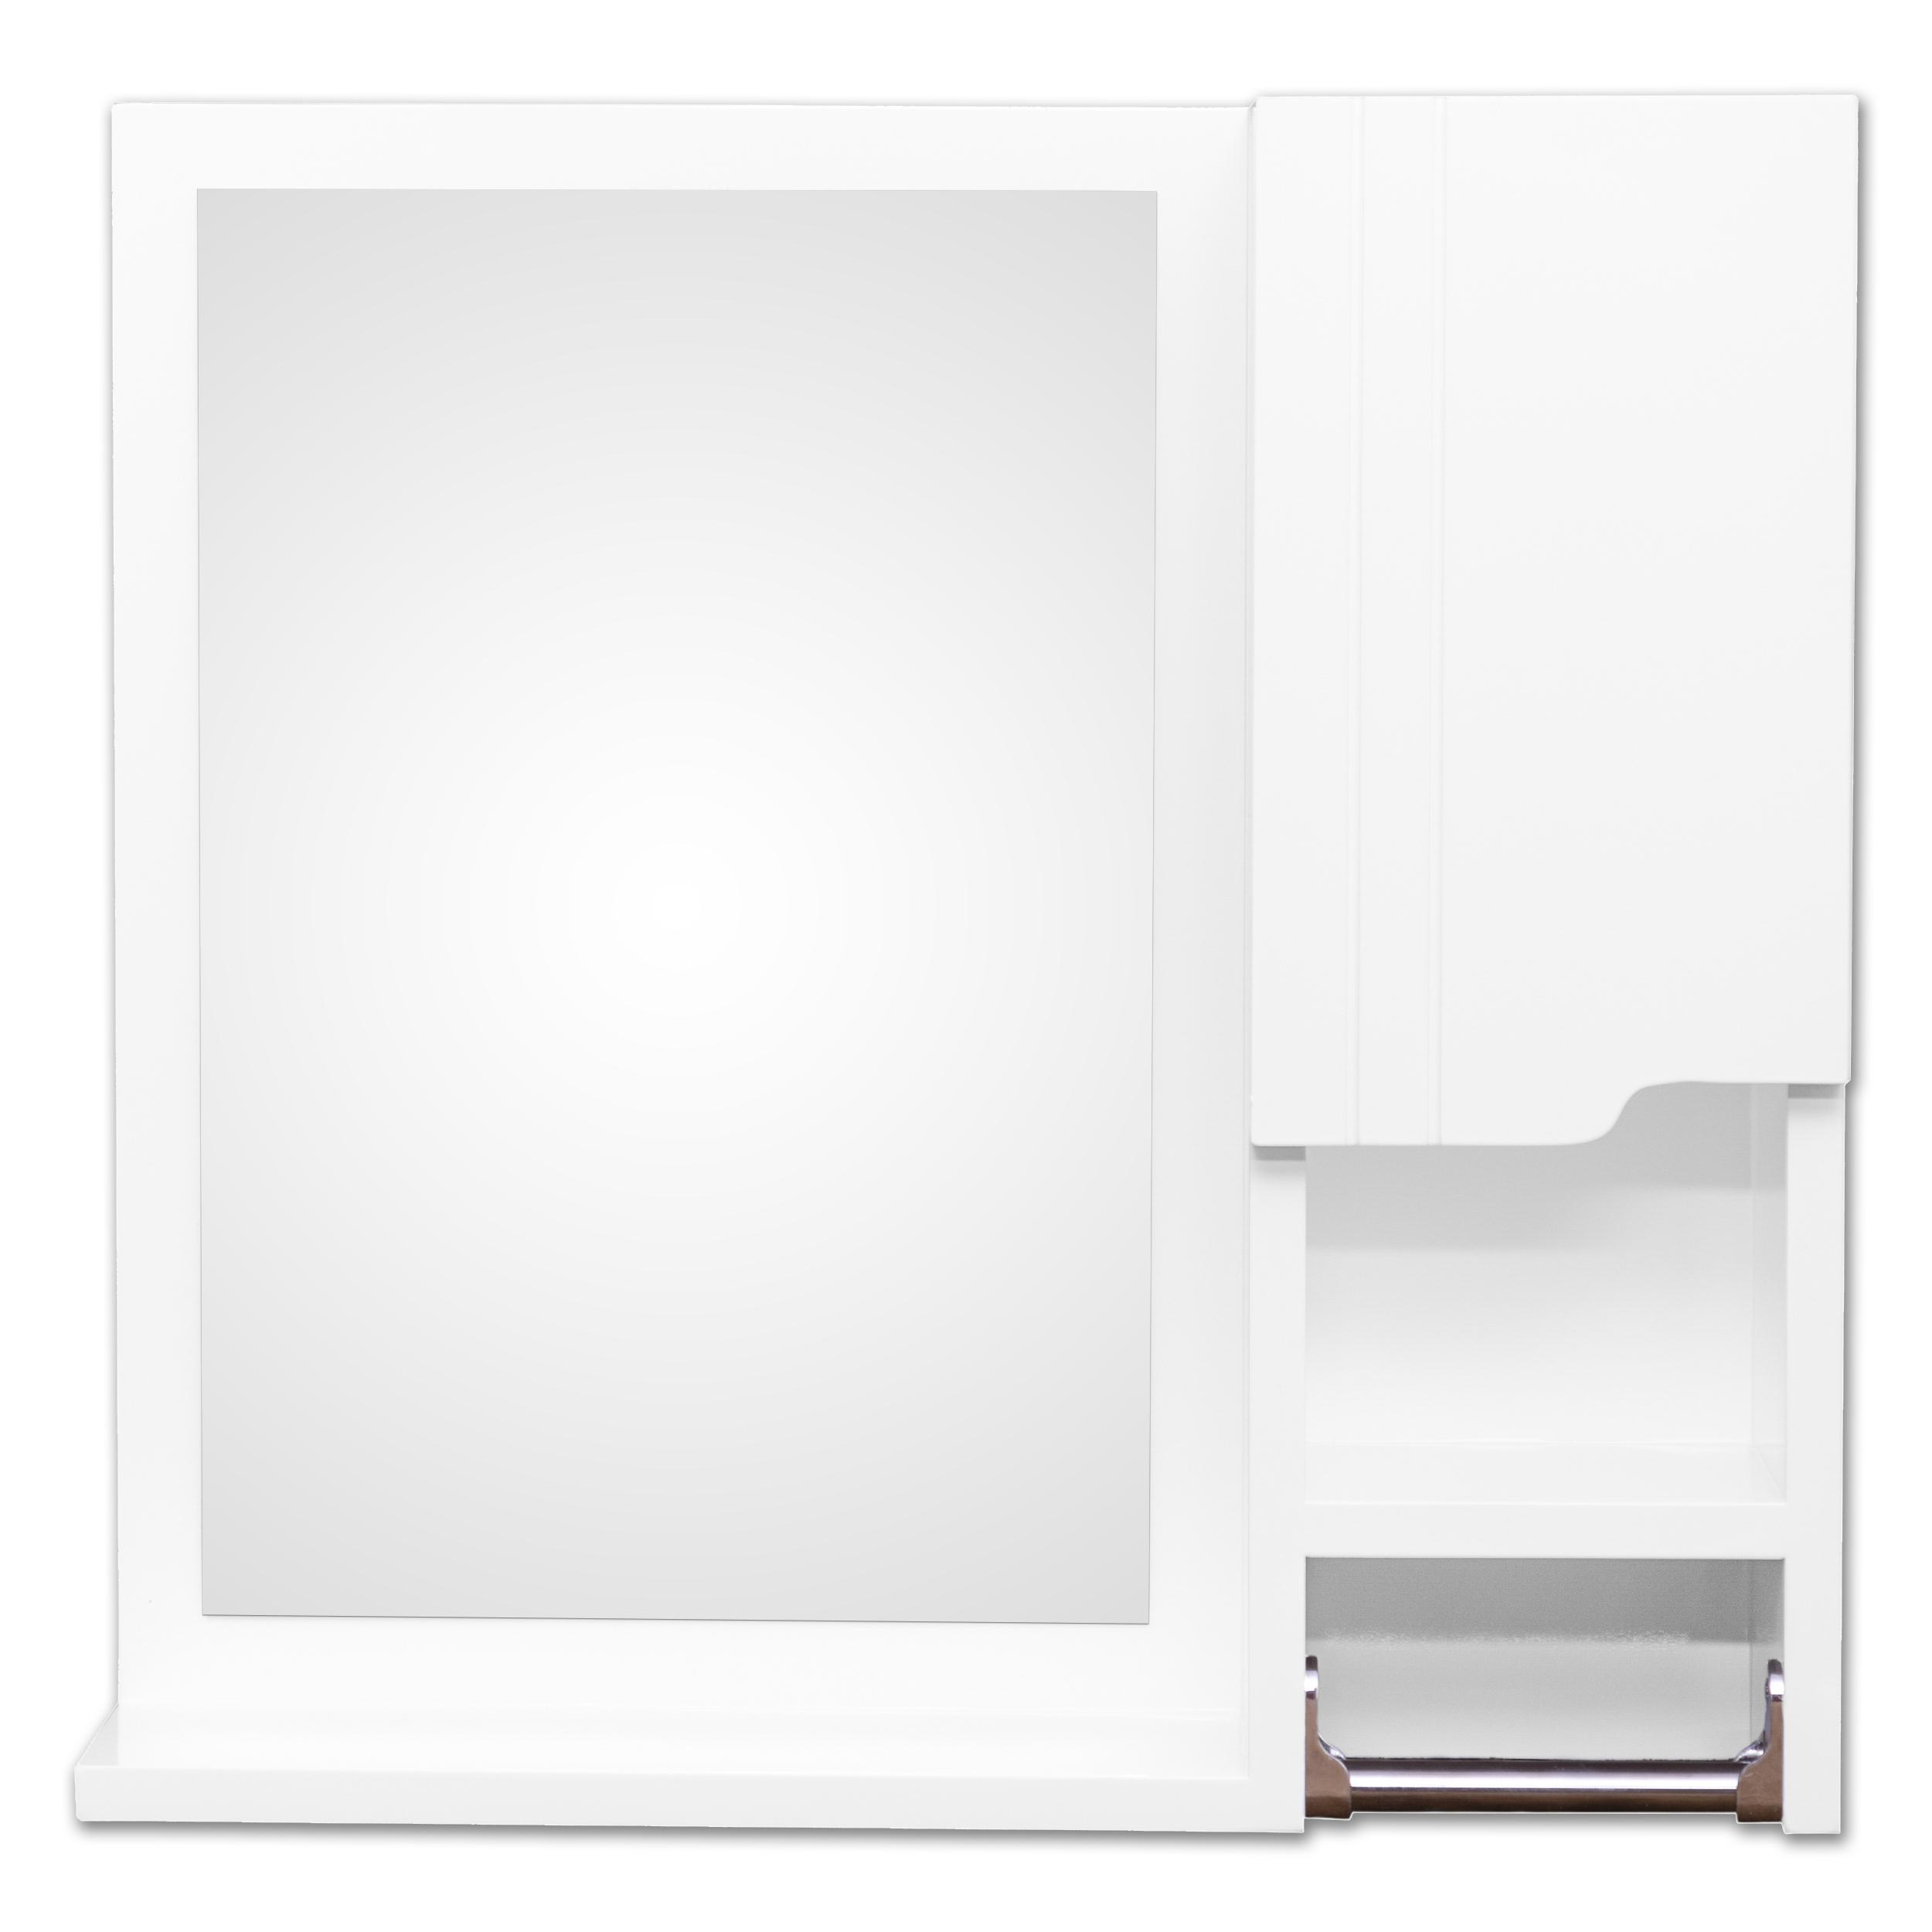 آینه باکس مدل پتوس کد 2021